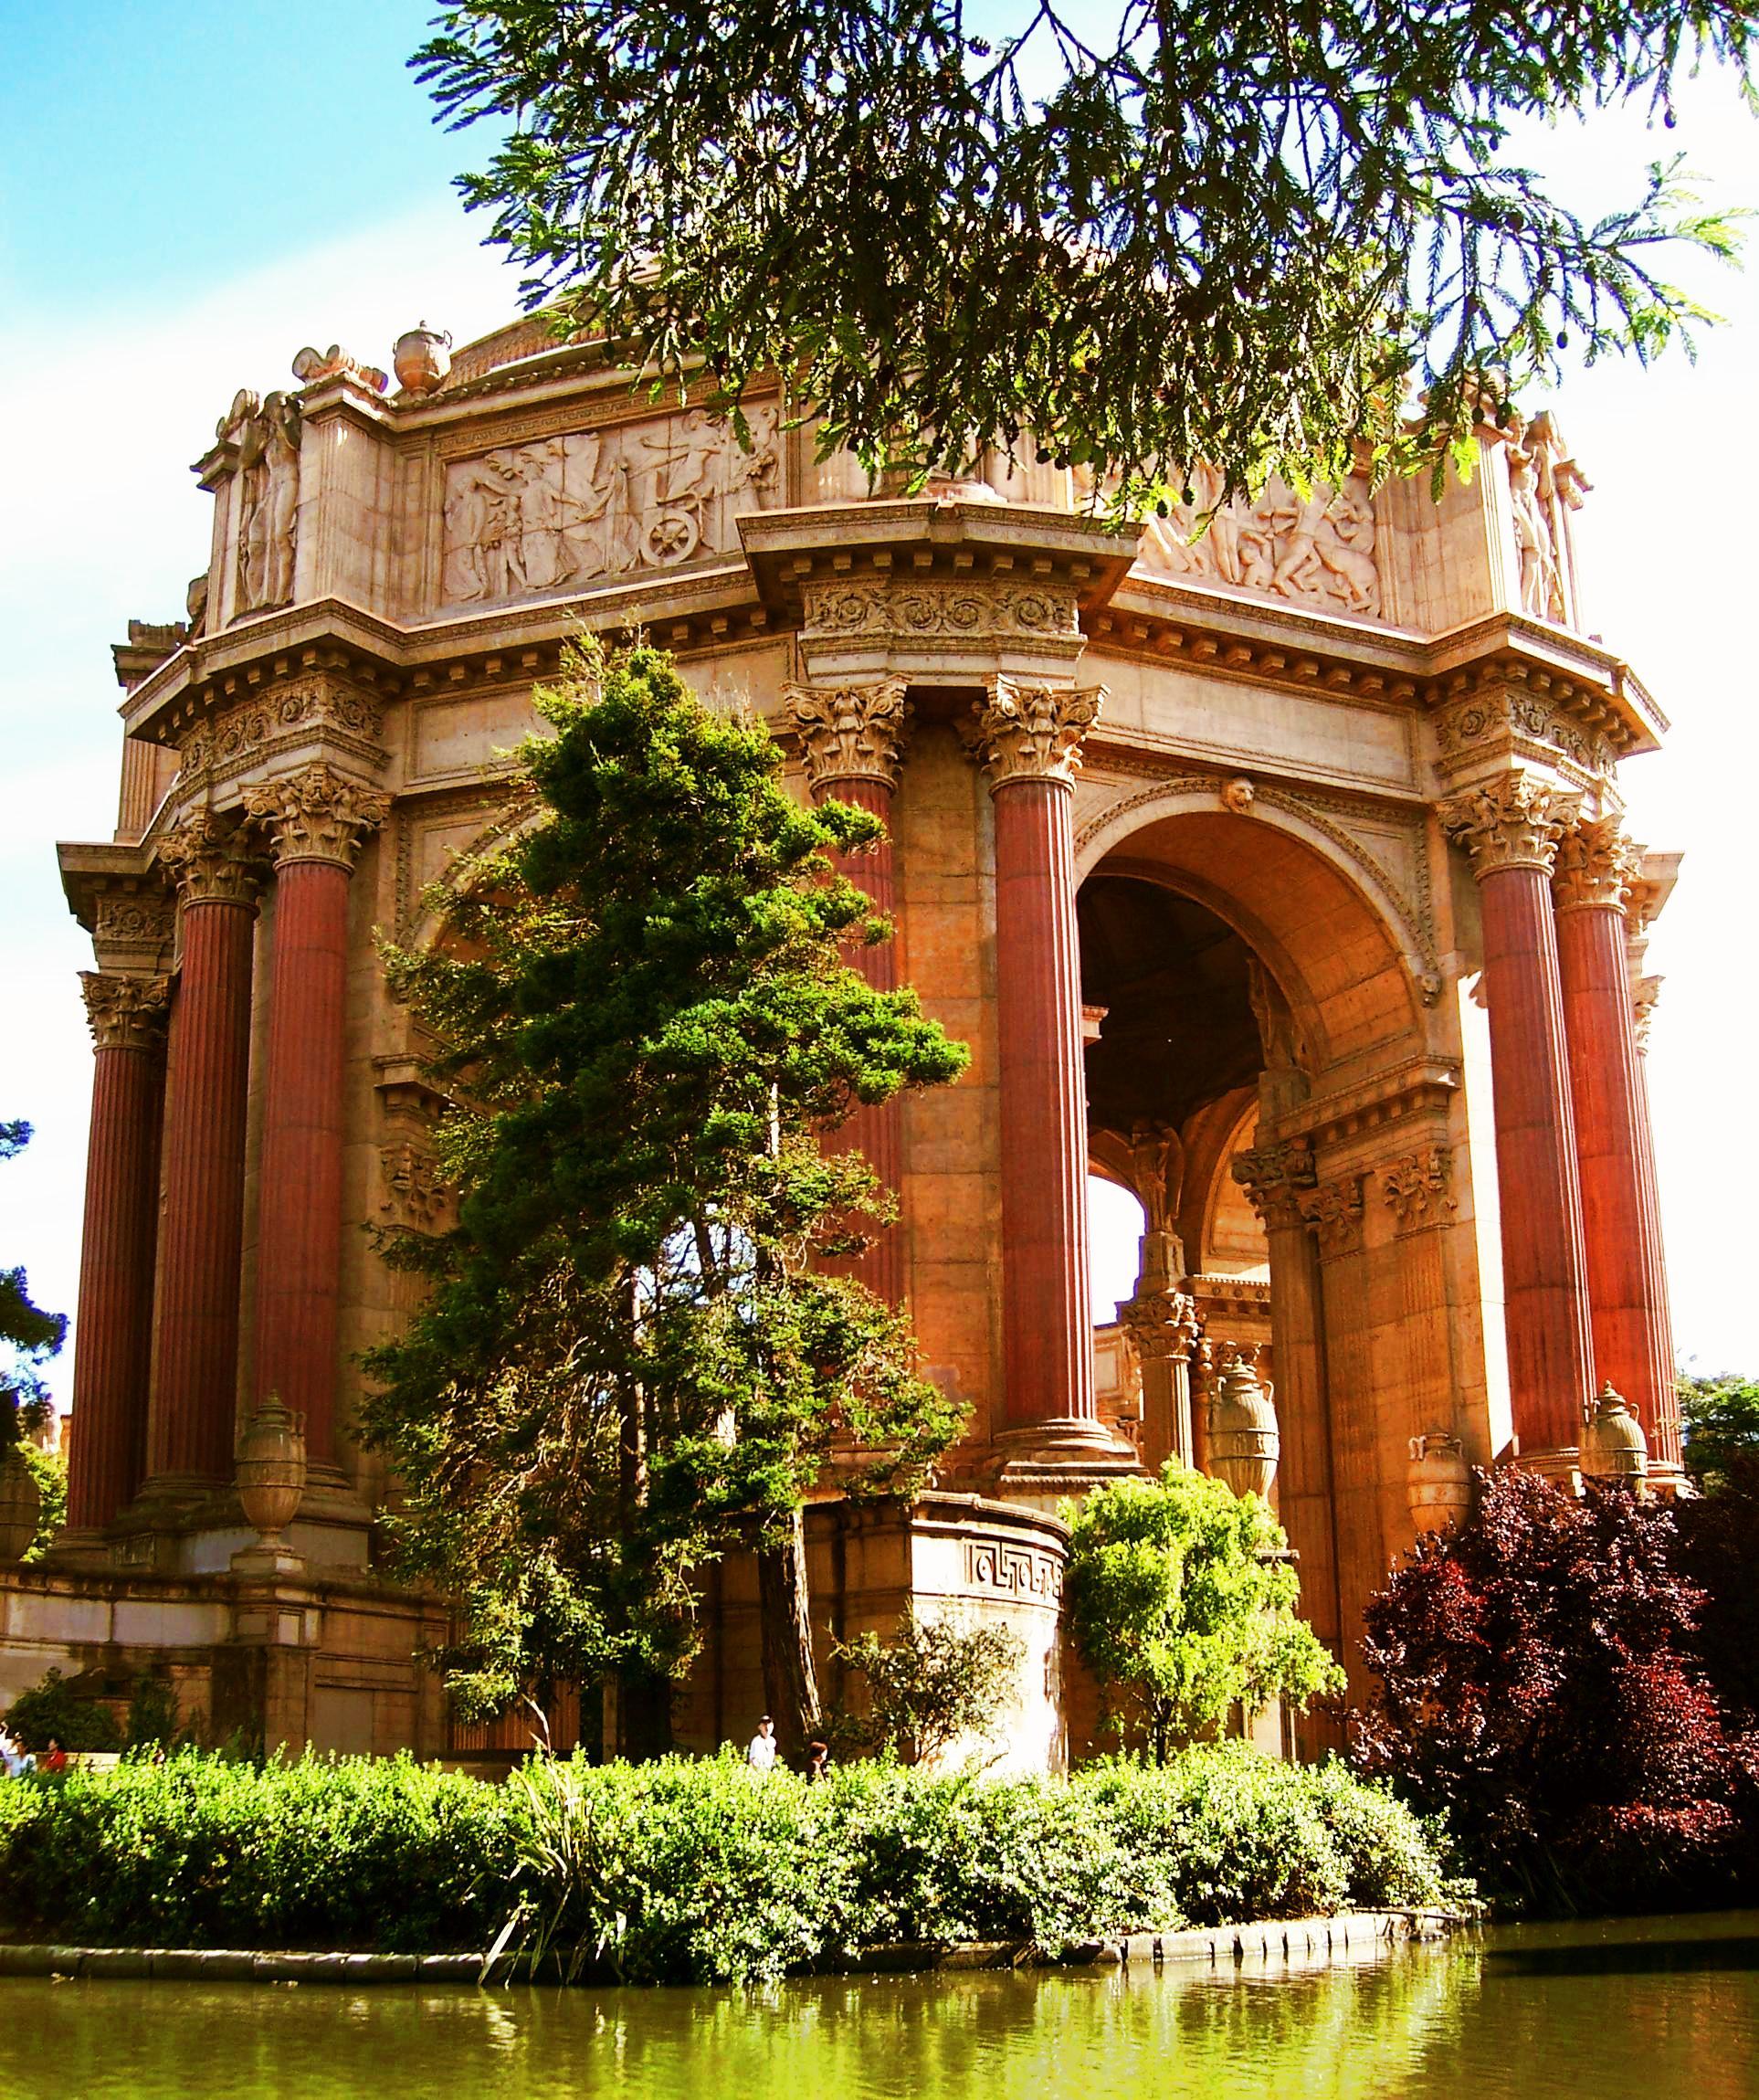 Palace_of_fine_arts_2006.JPG